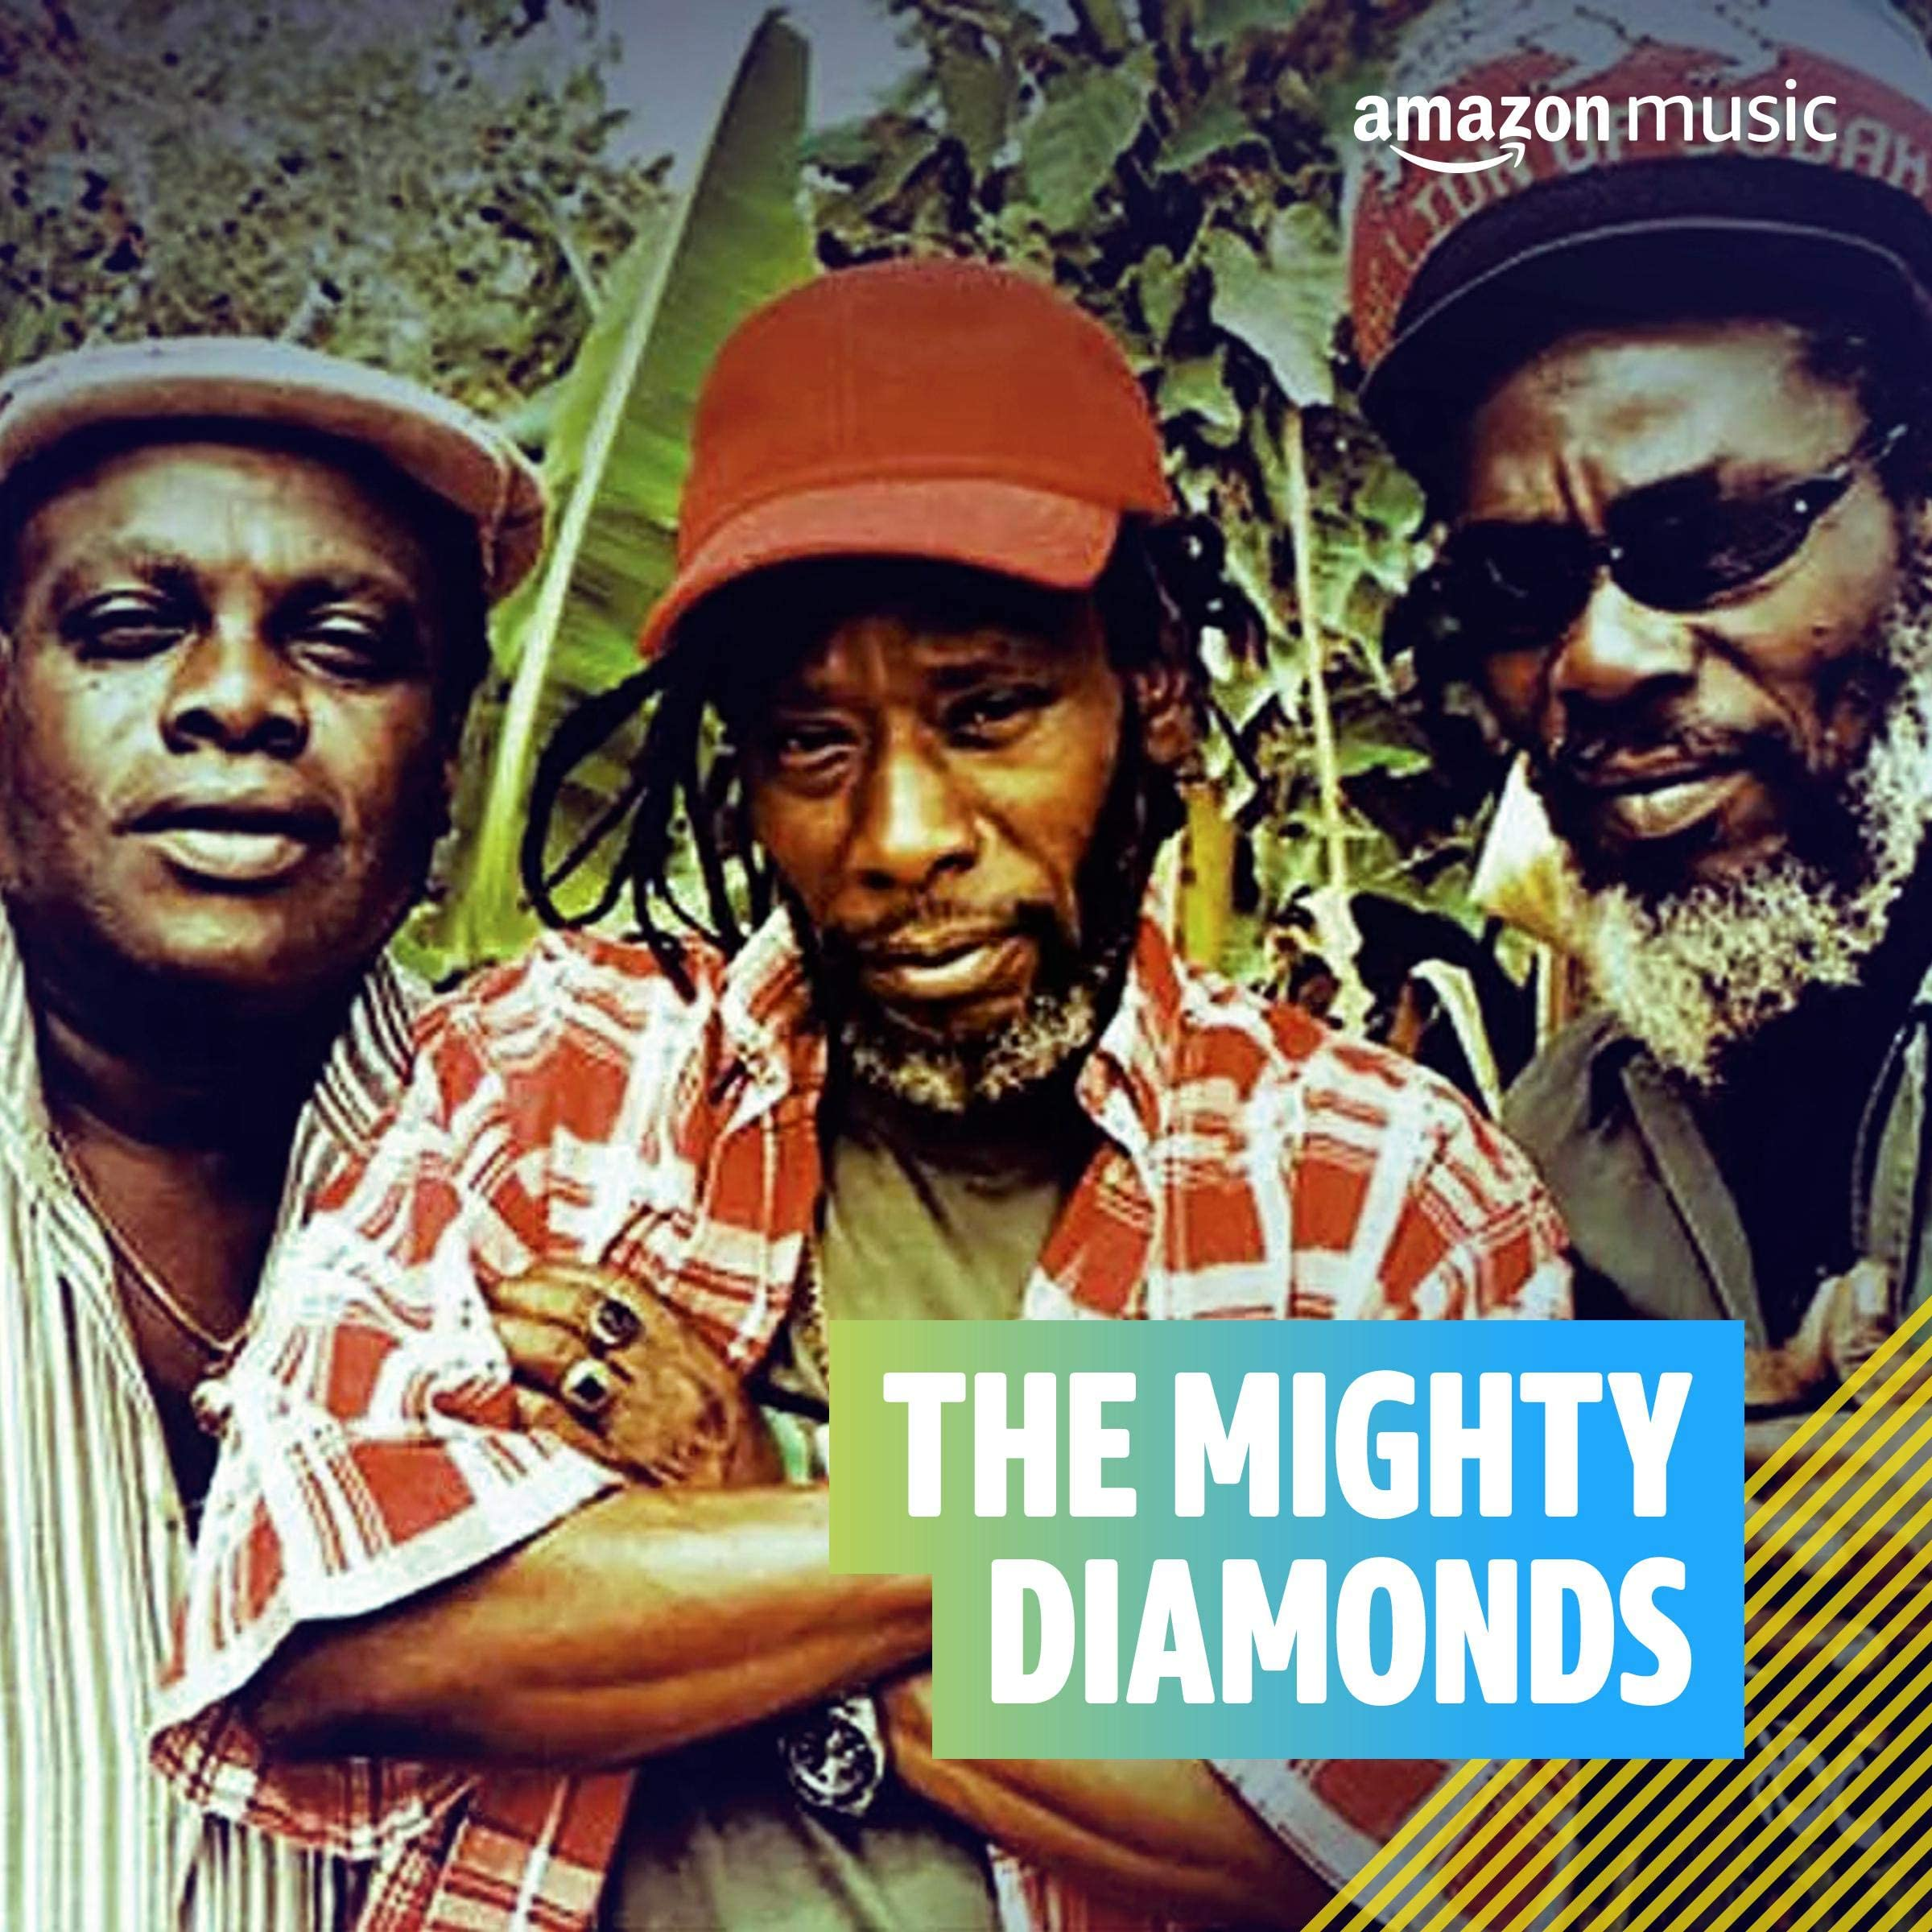 The Mighty Diamonds